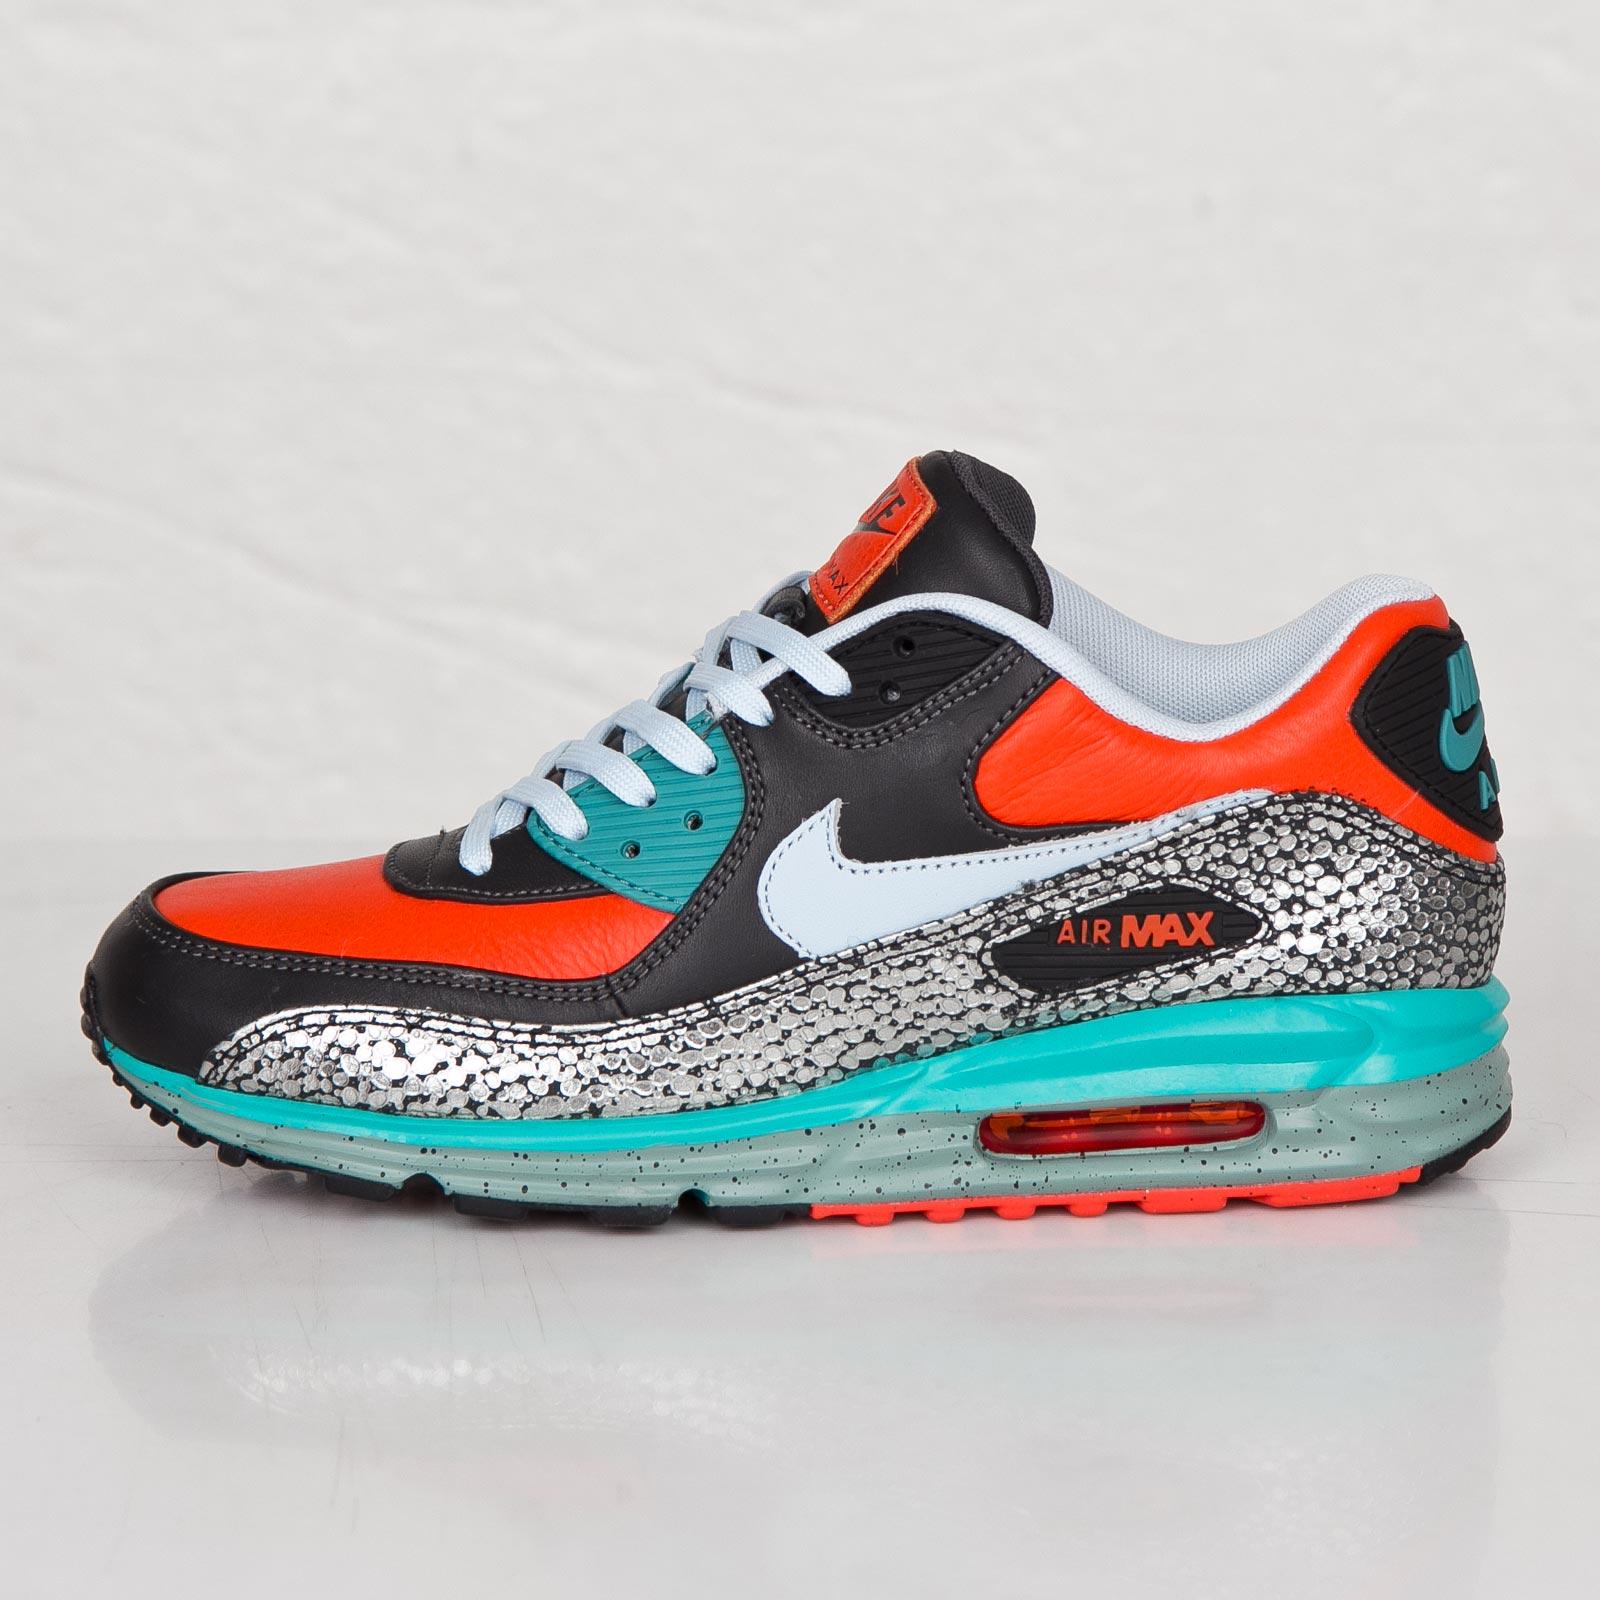 Qs Sneakersnstuff Max Nike 800 Deluxe Air Lunar90 726933 qxIwSwf0O